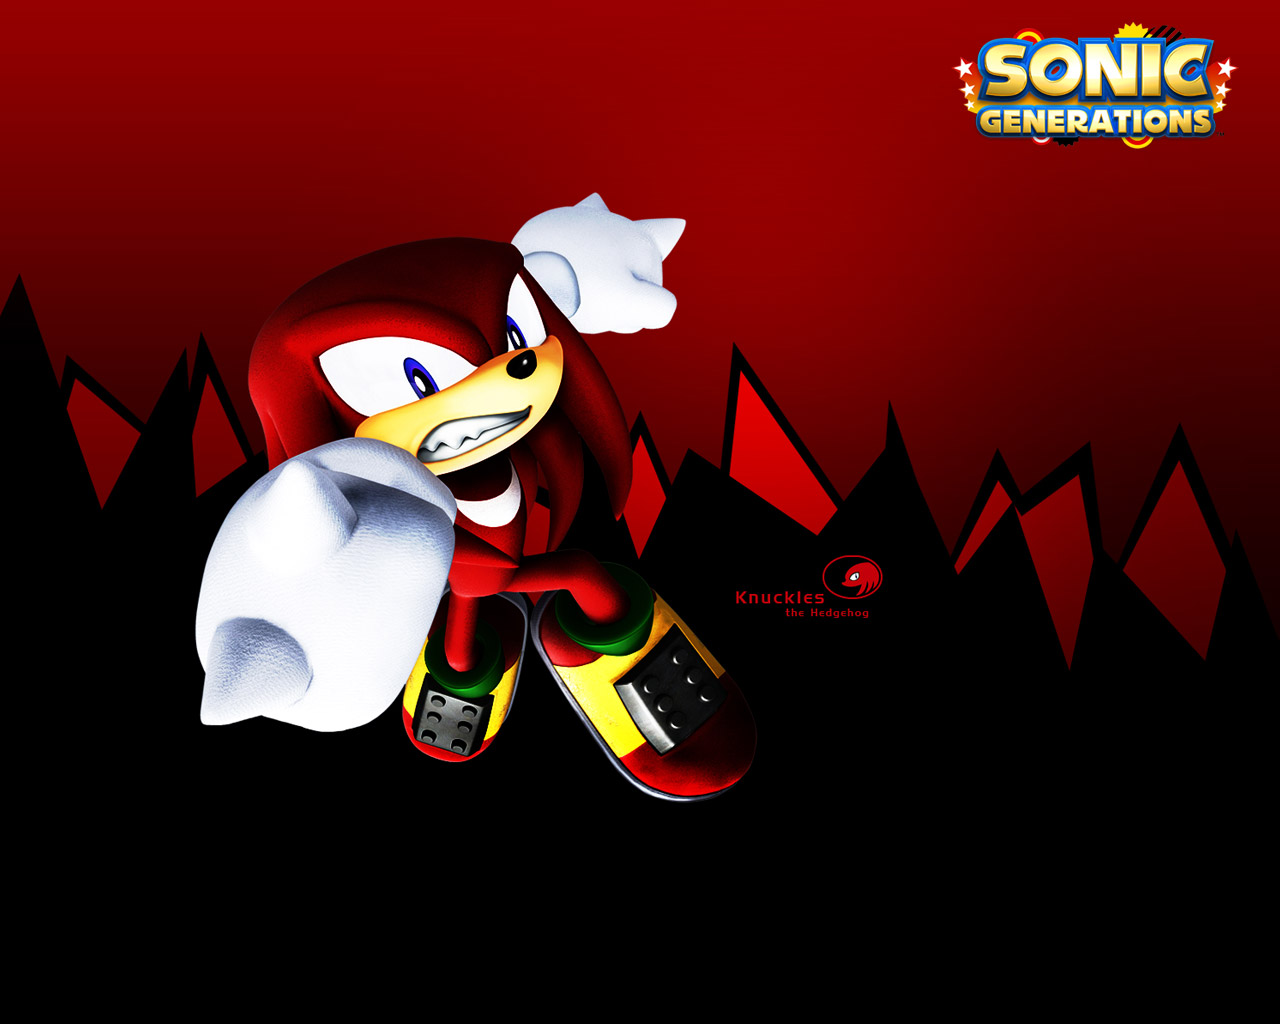 Free Sonic Generations Wallpaper in 1280x1024